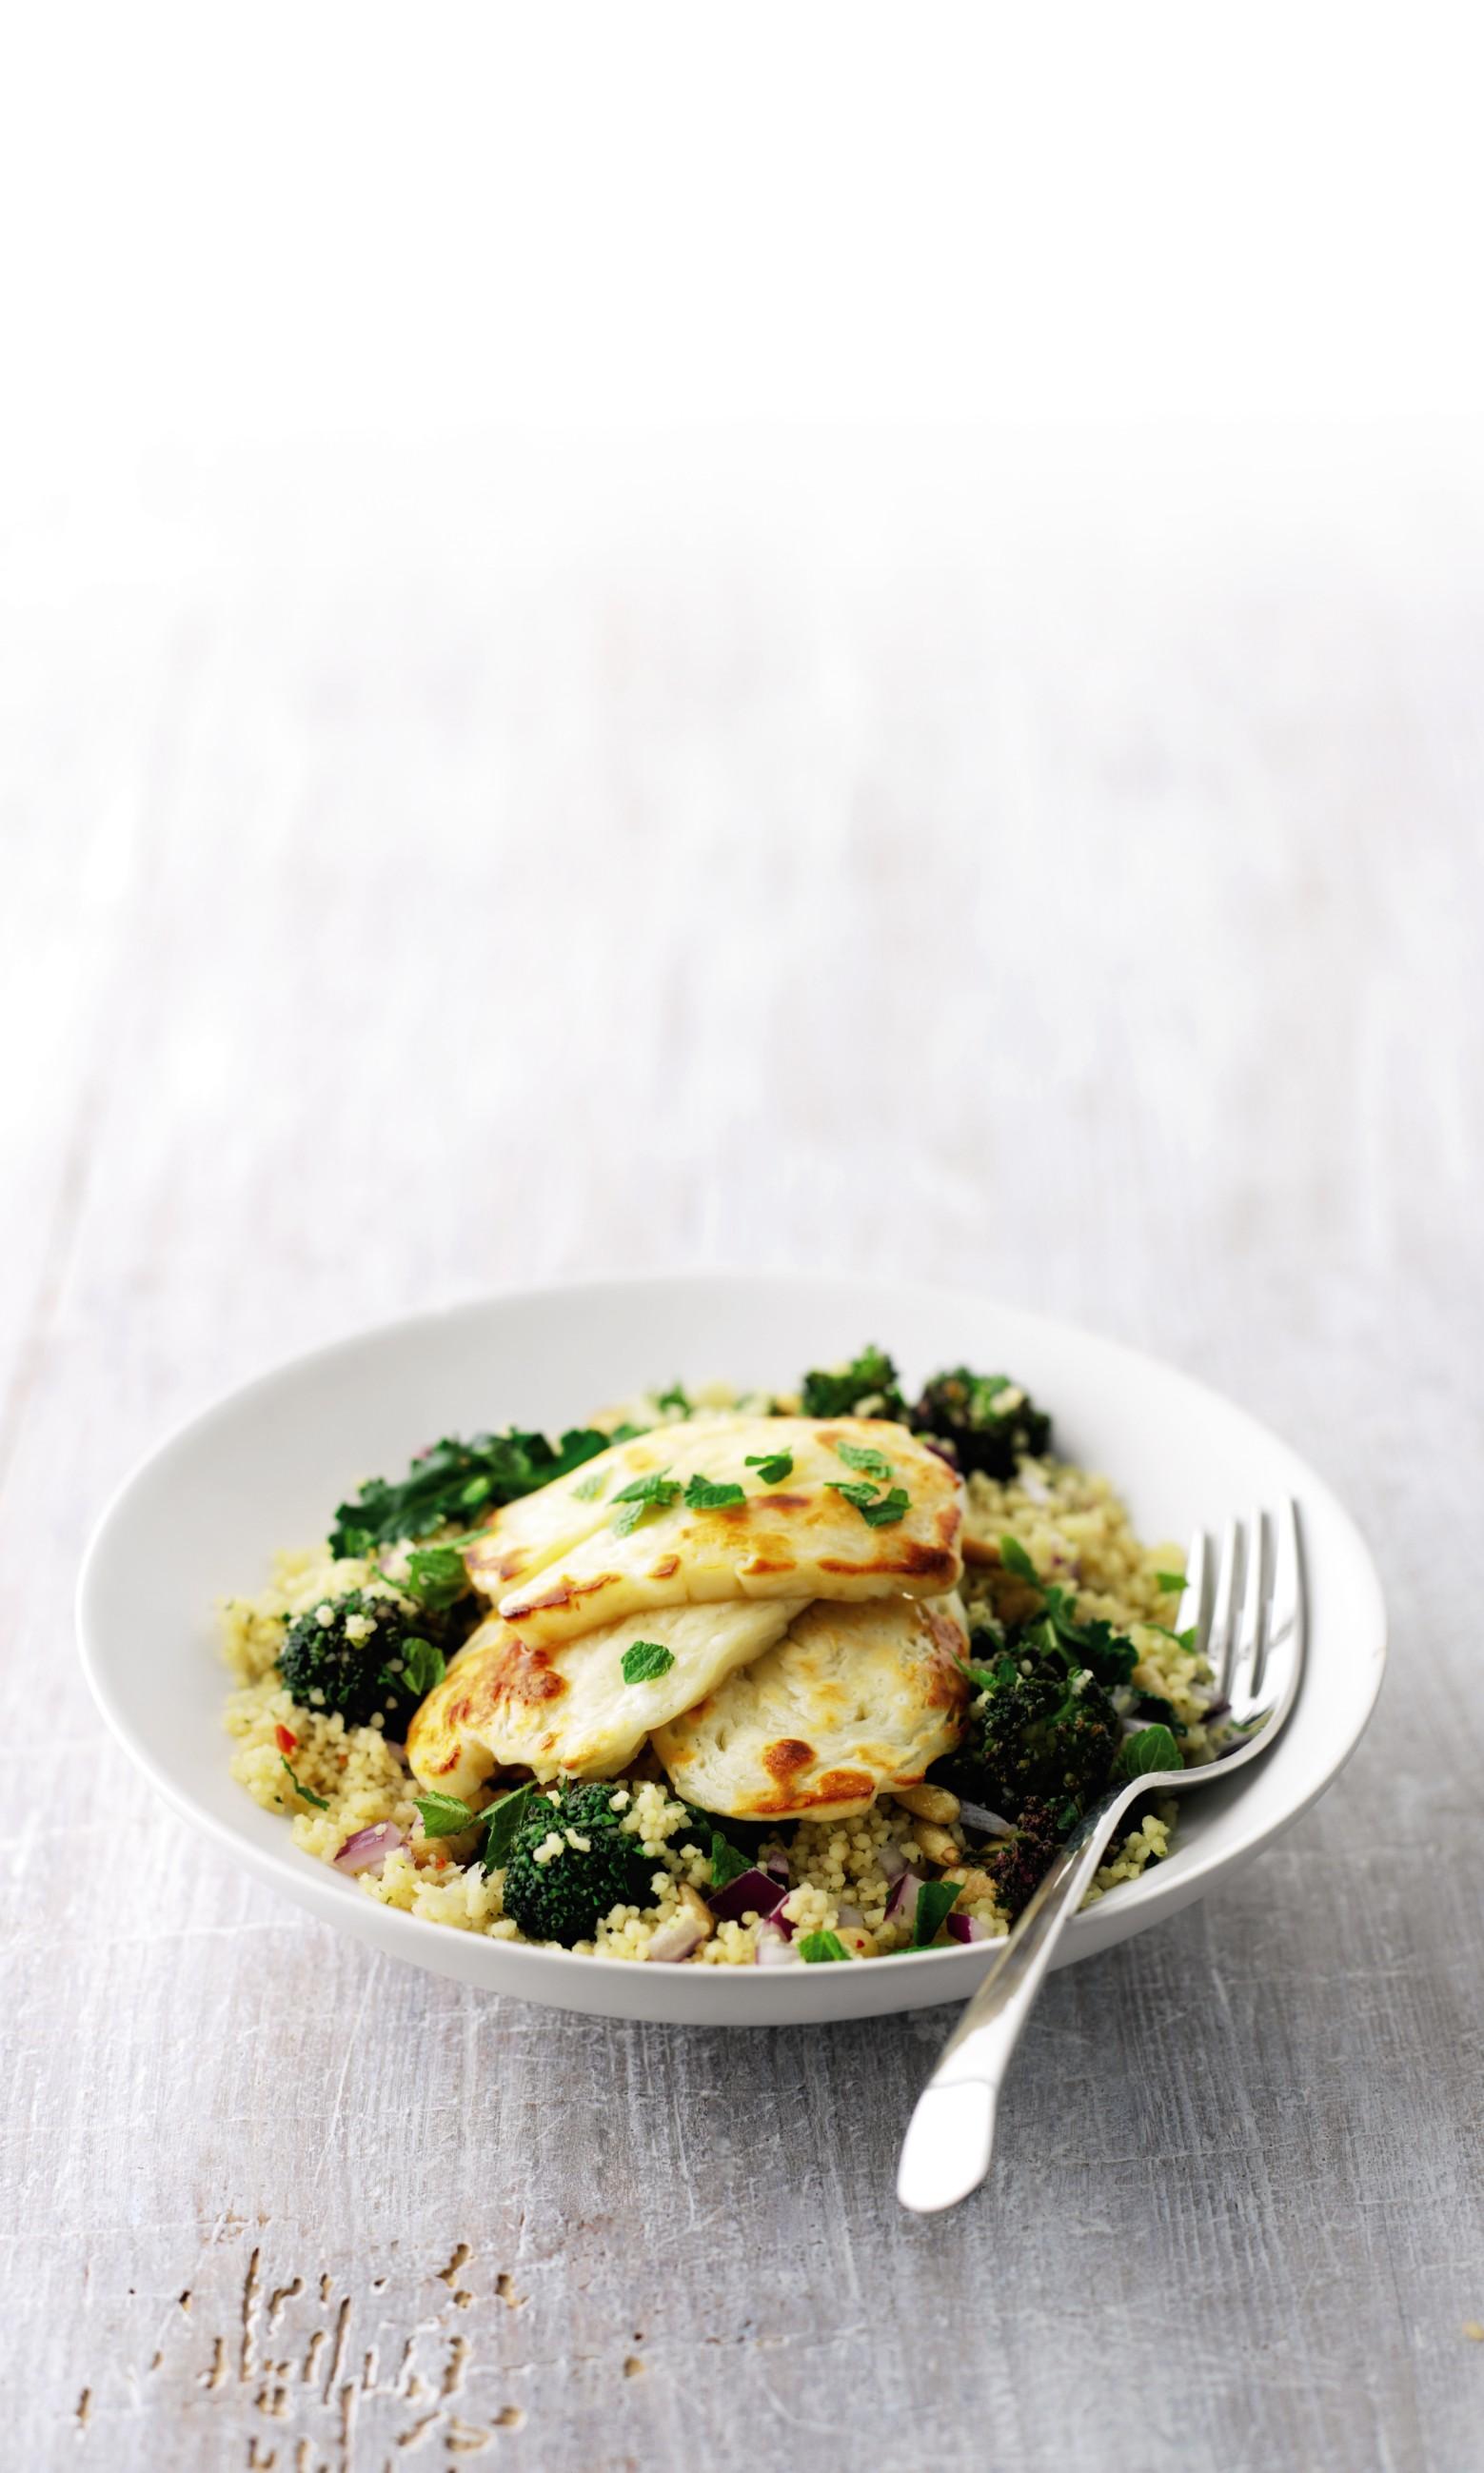 Recipe: Warm Couscous Salad with Halloumi